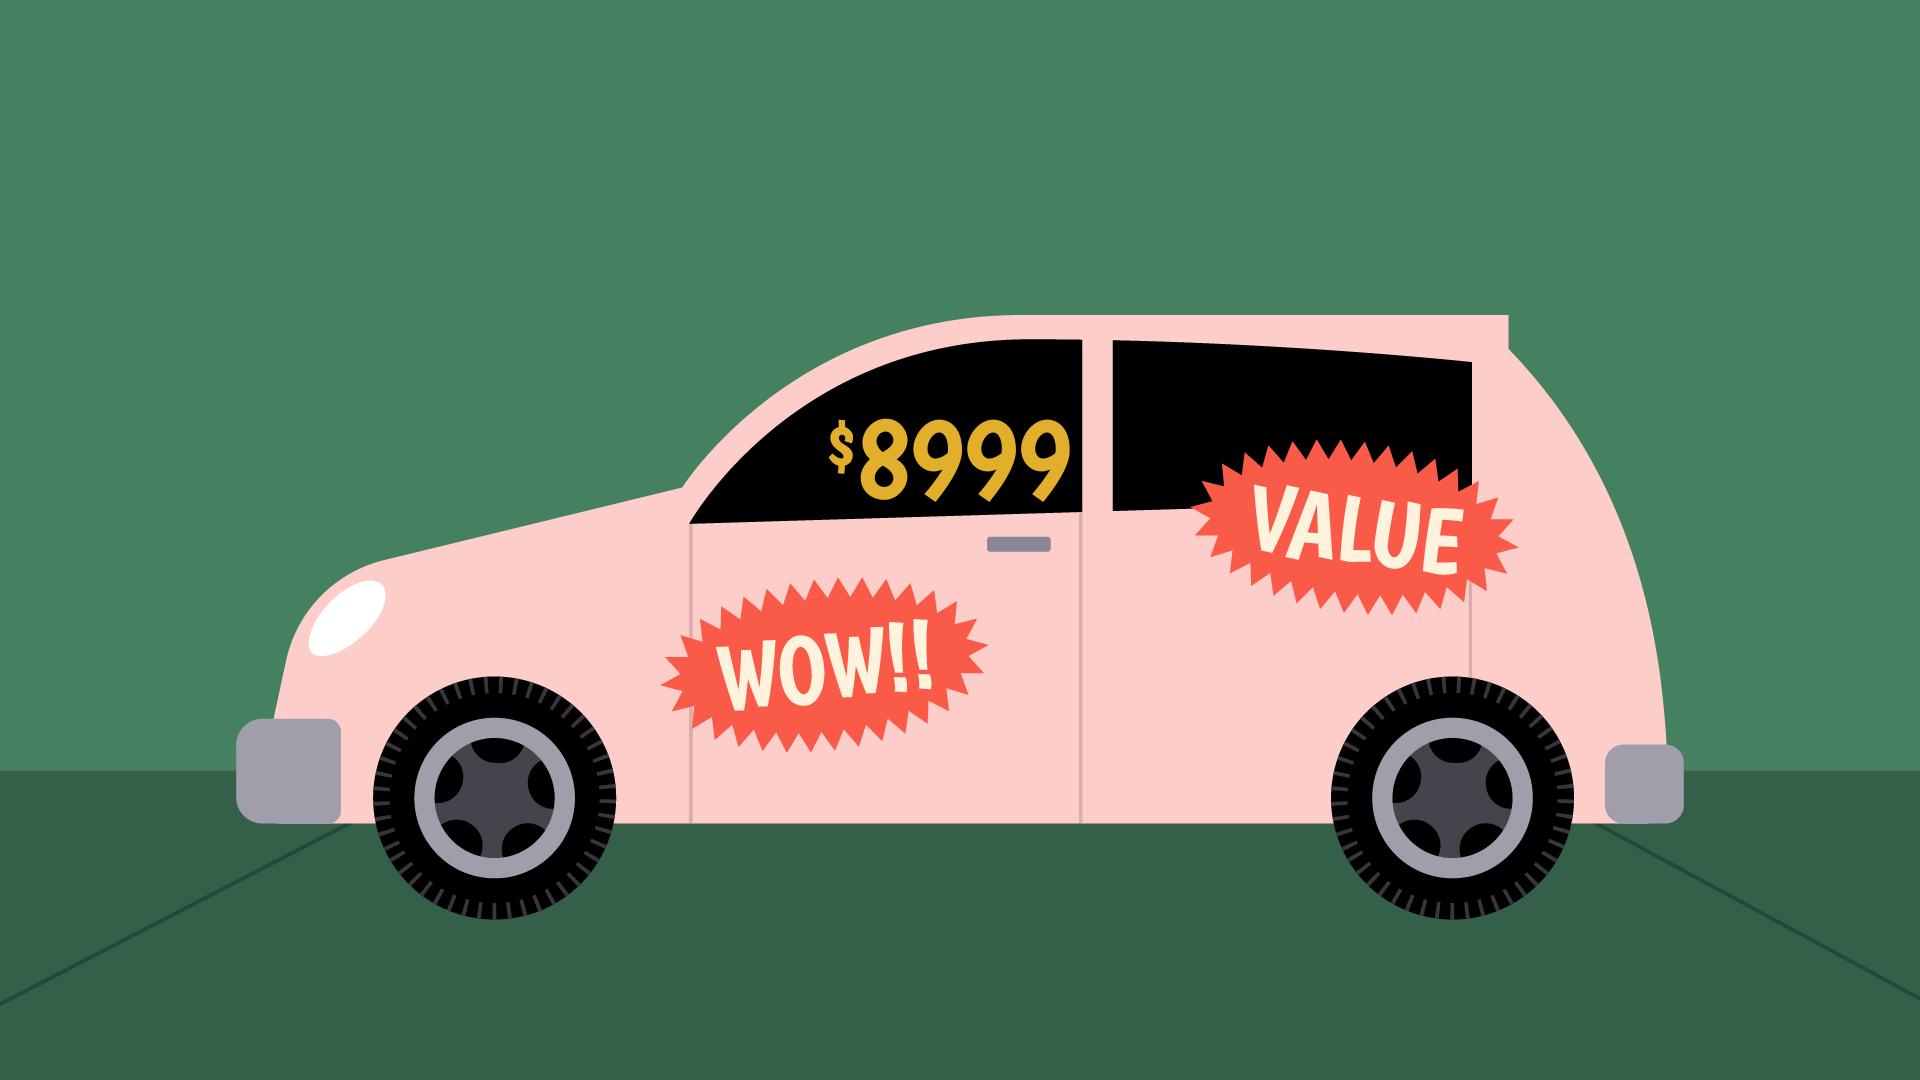 car $8999 price tag